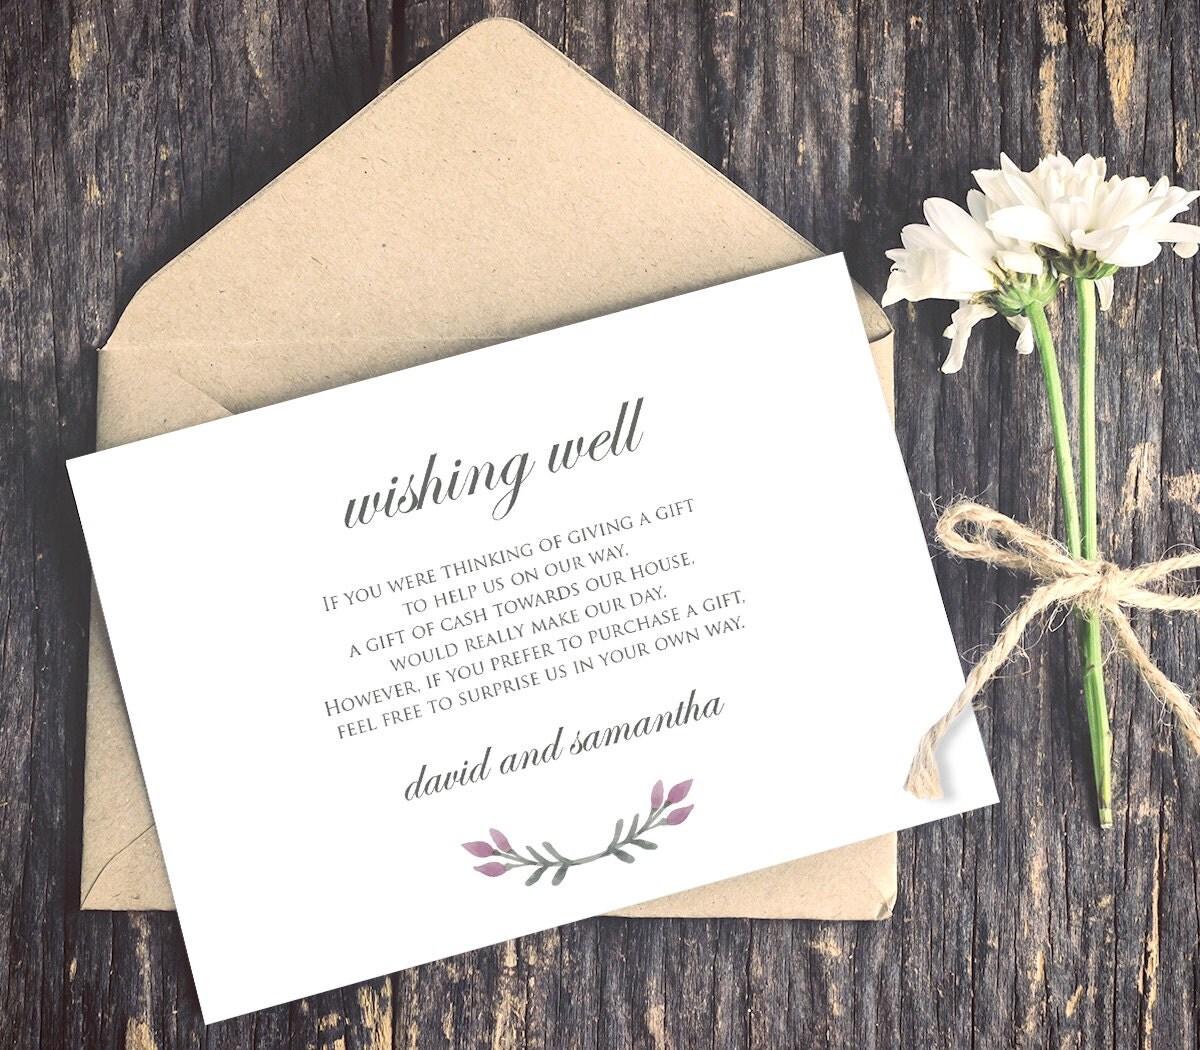 wedding wishing well card template lieu wishing well wedding Wedding Wishing Well Card Template Lieu of Gifts Poem INSTANT DOWNLOAD Editable Text DiY Wedding Insert PDF Template Digital Download